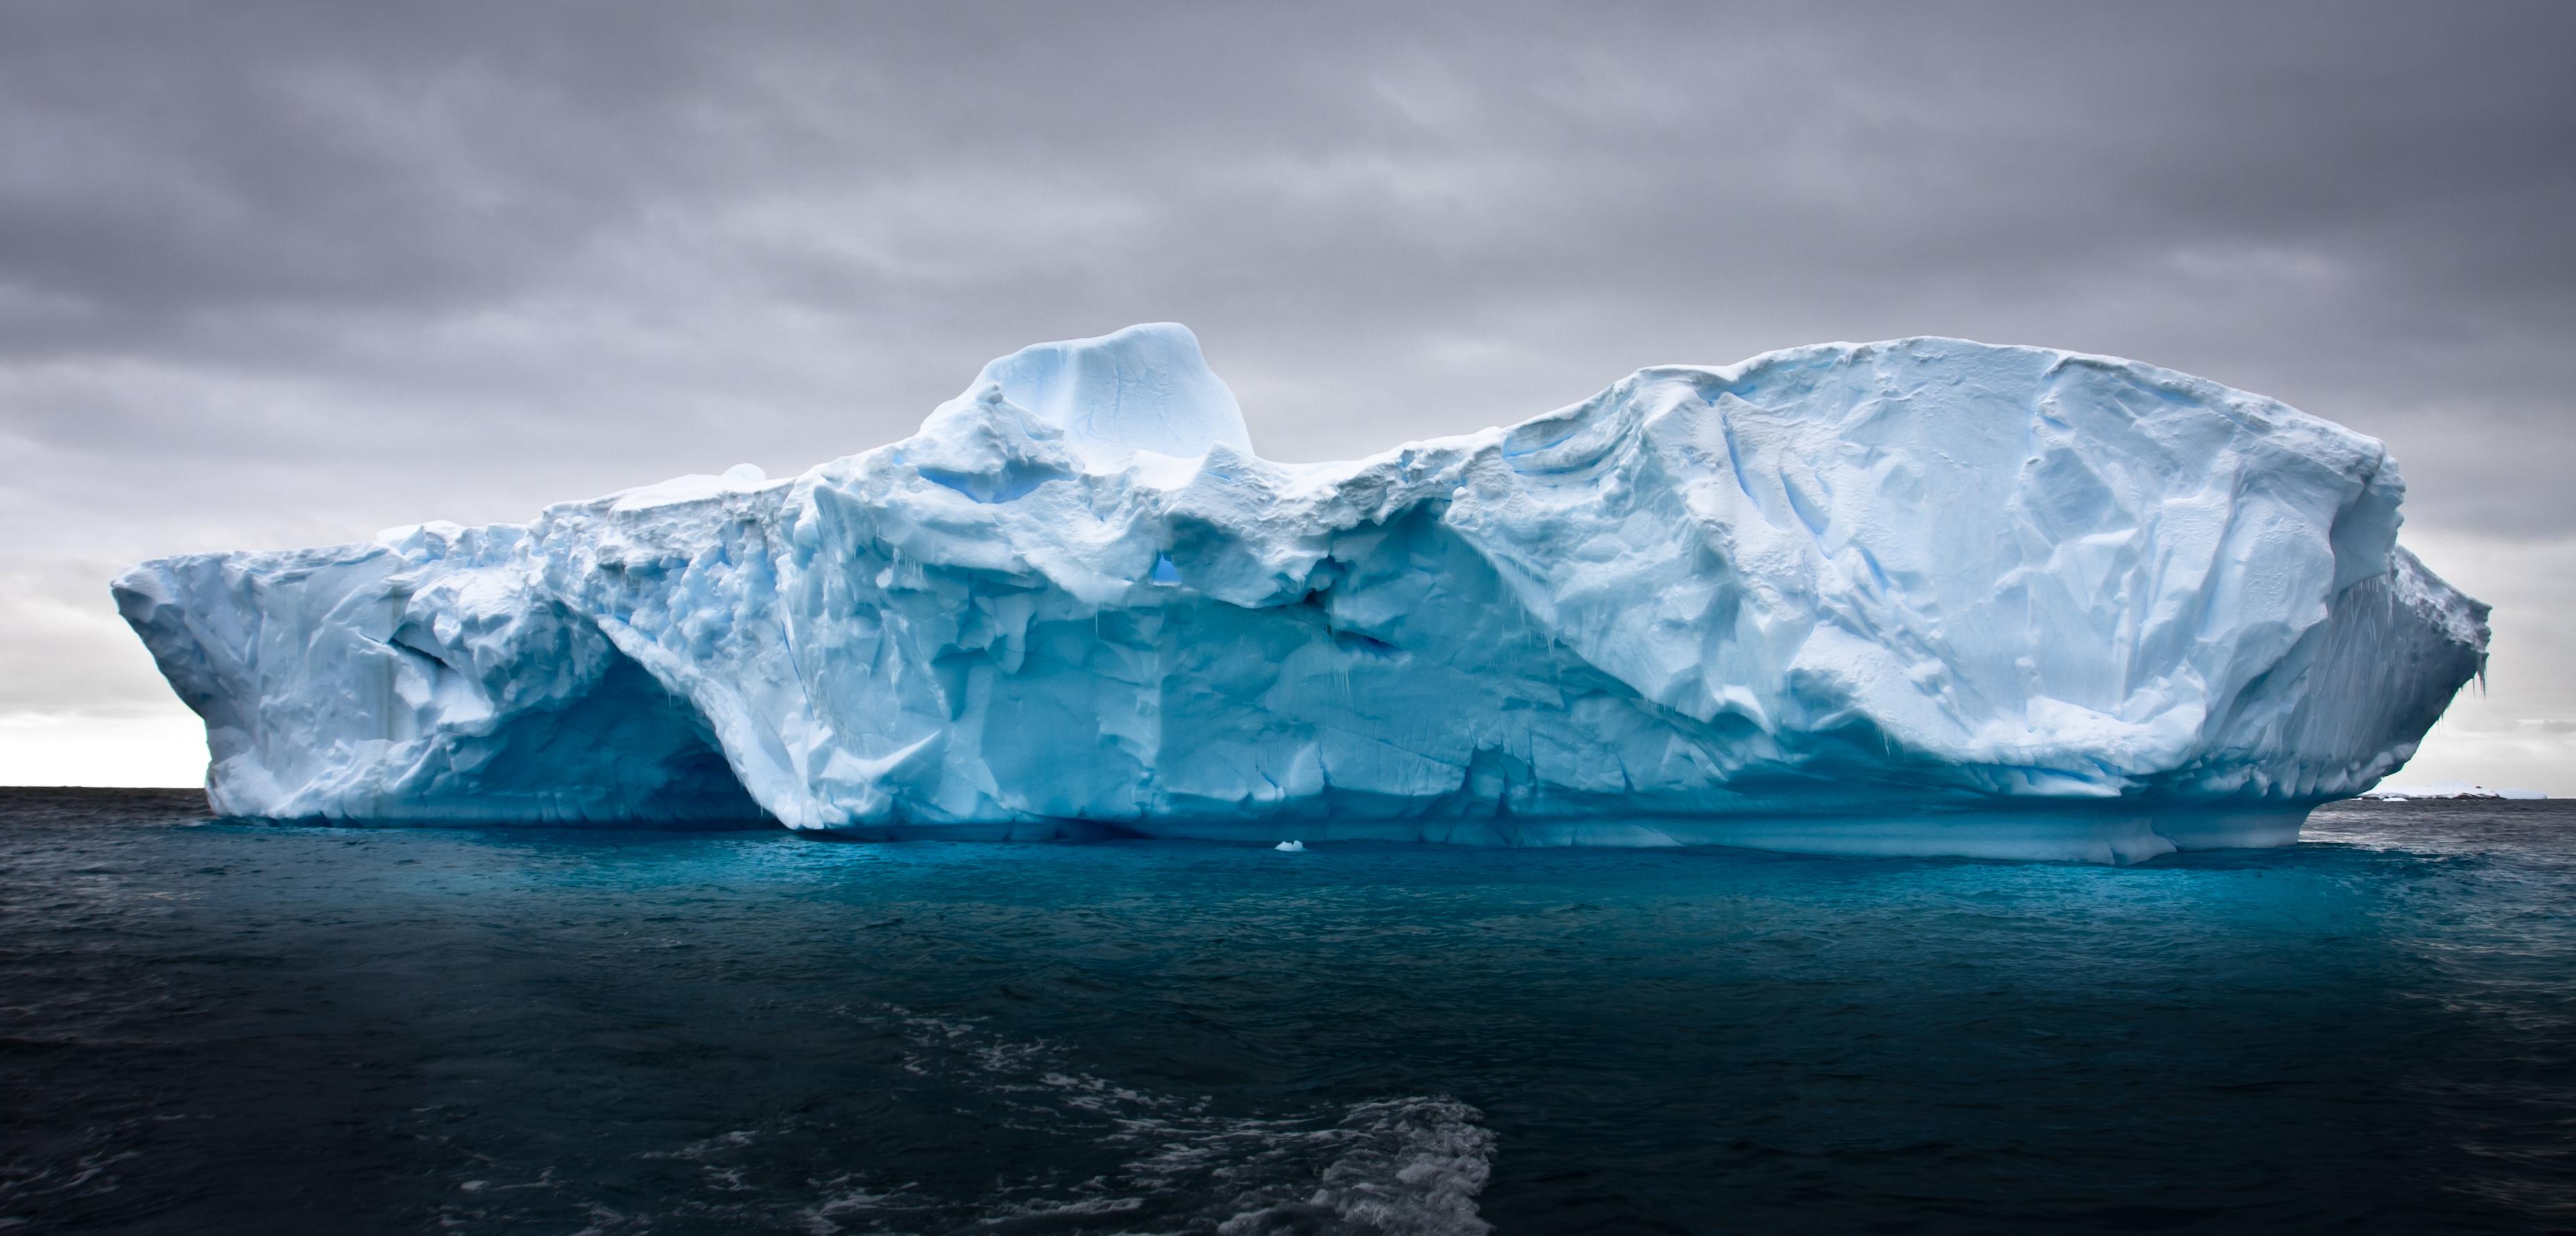 HQ Iceberg Wallpapers | File 3031.26Kb